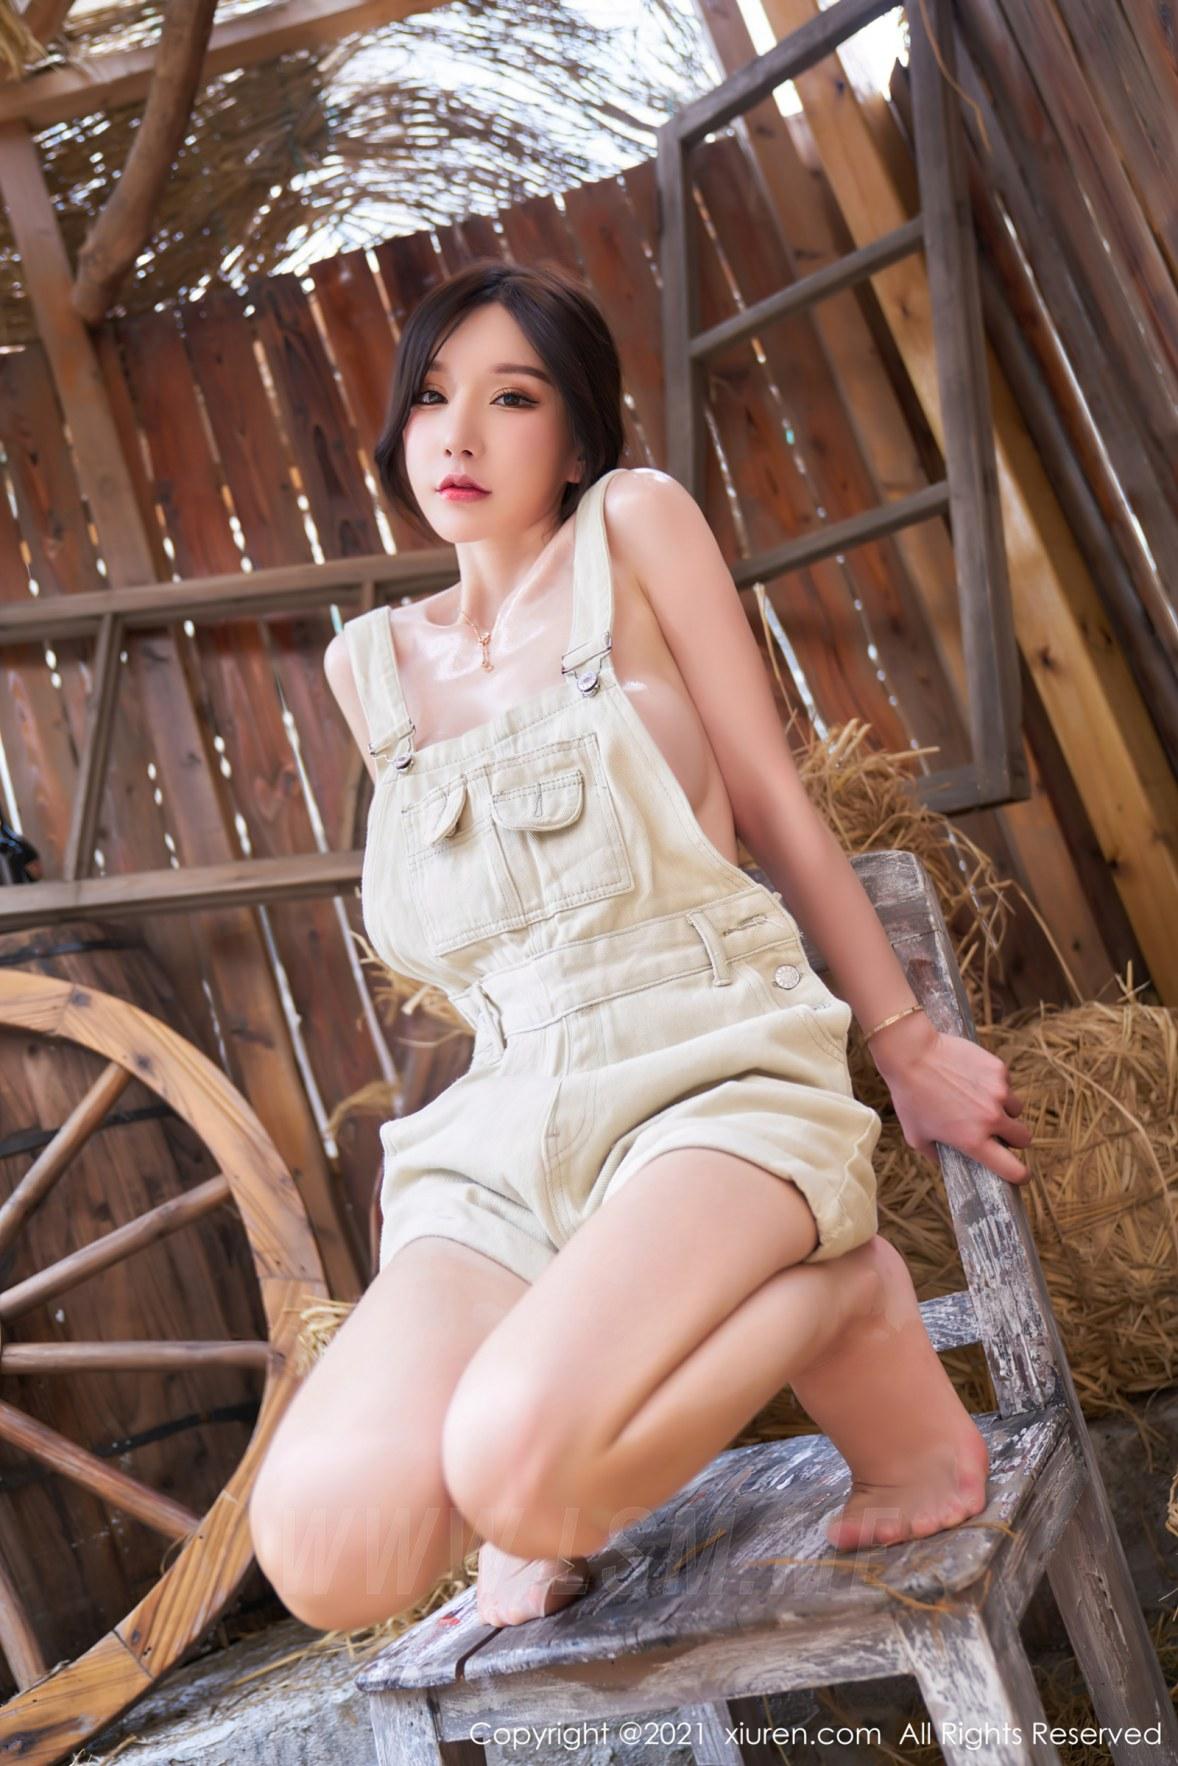 3741 030 pq5 3603 5400 - XiuRen 秀人 No.3741 西部农场风格 周于希Sandy 性感写真111 - 秀人网 -【免费在线写真】【丽人丝语】